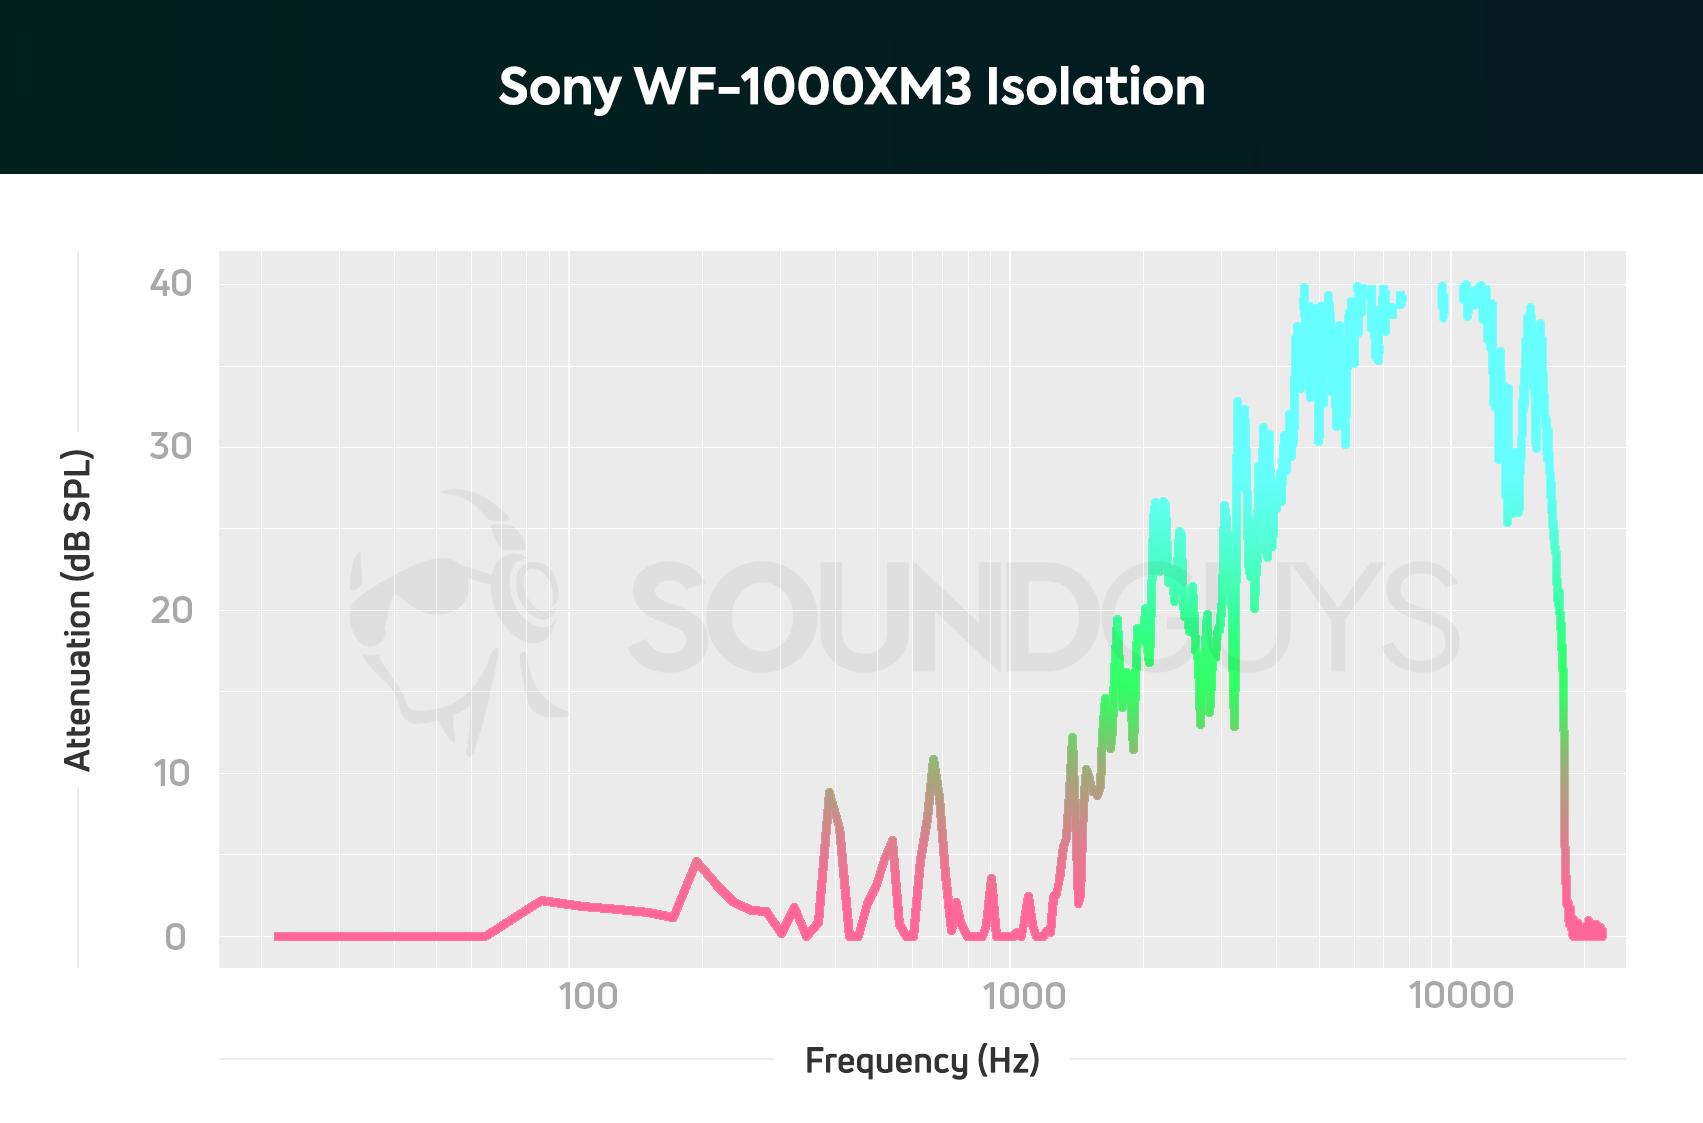 Sony WF-1000XM3 isolation